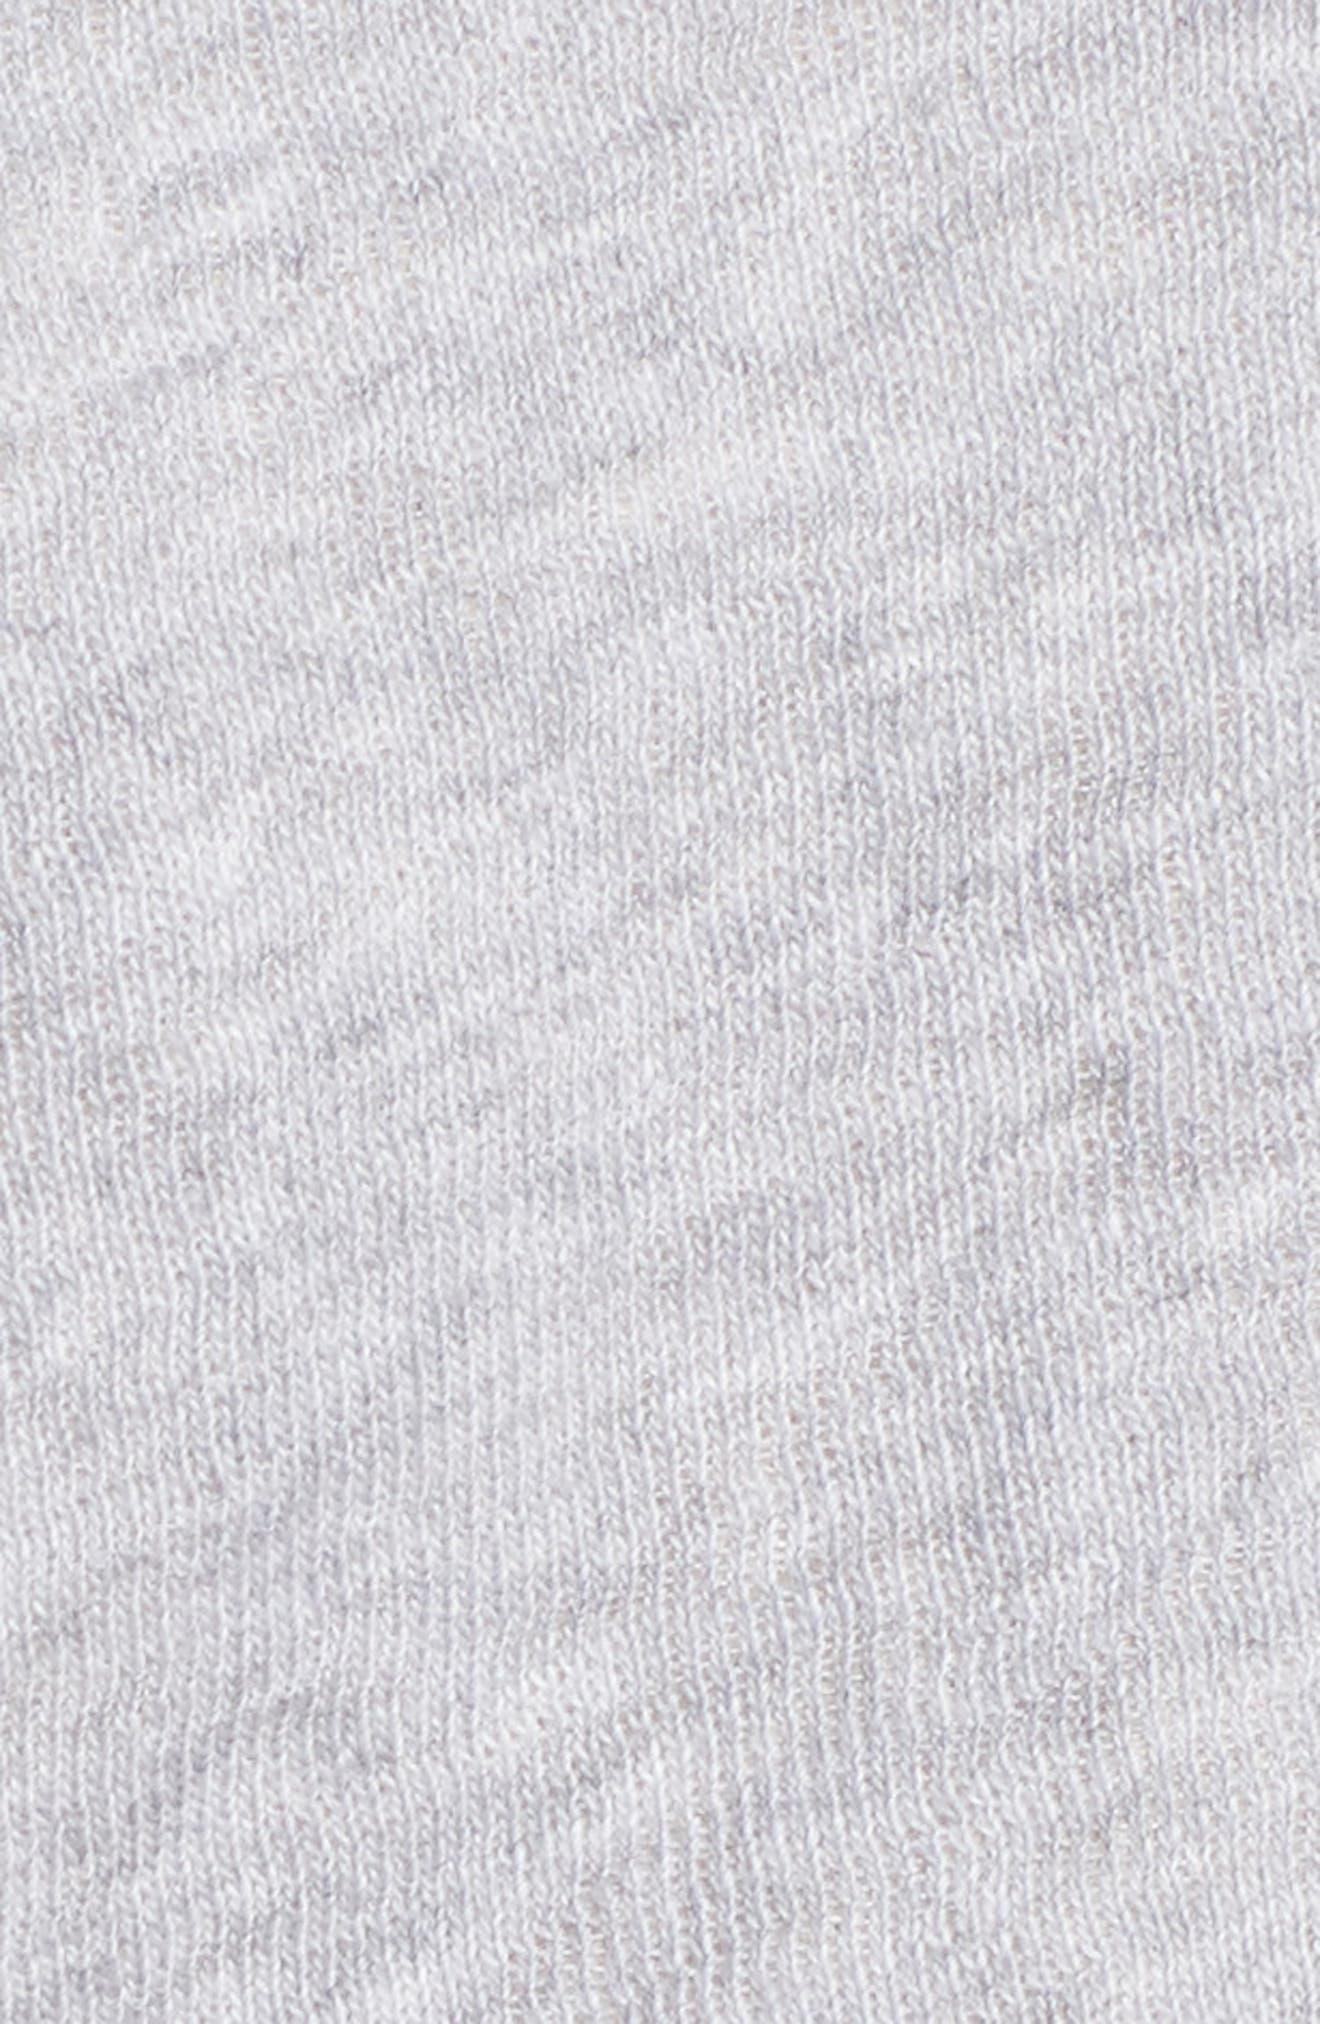 Organic Cotton Knit Hooded Jacket,                             Alternate thumbnail 5, color,                             Dark Pearl